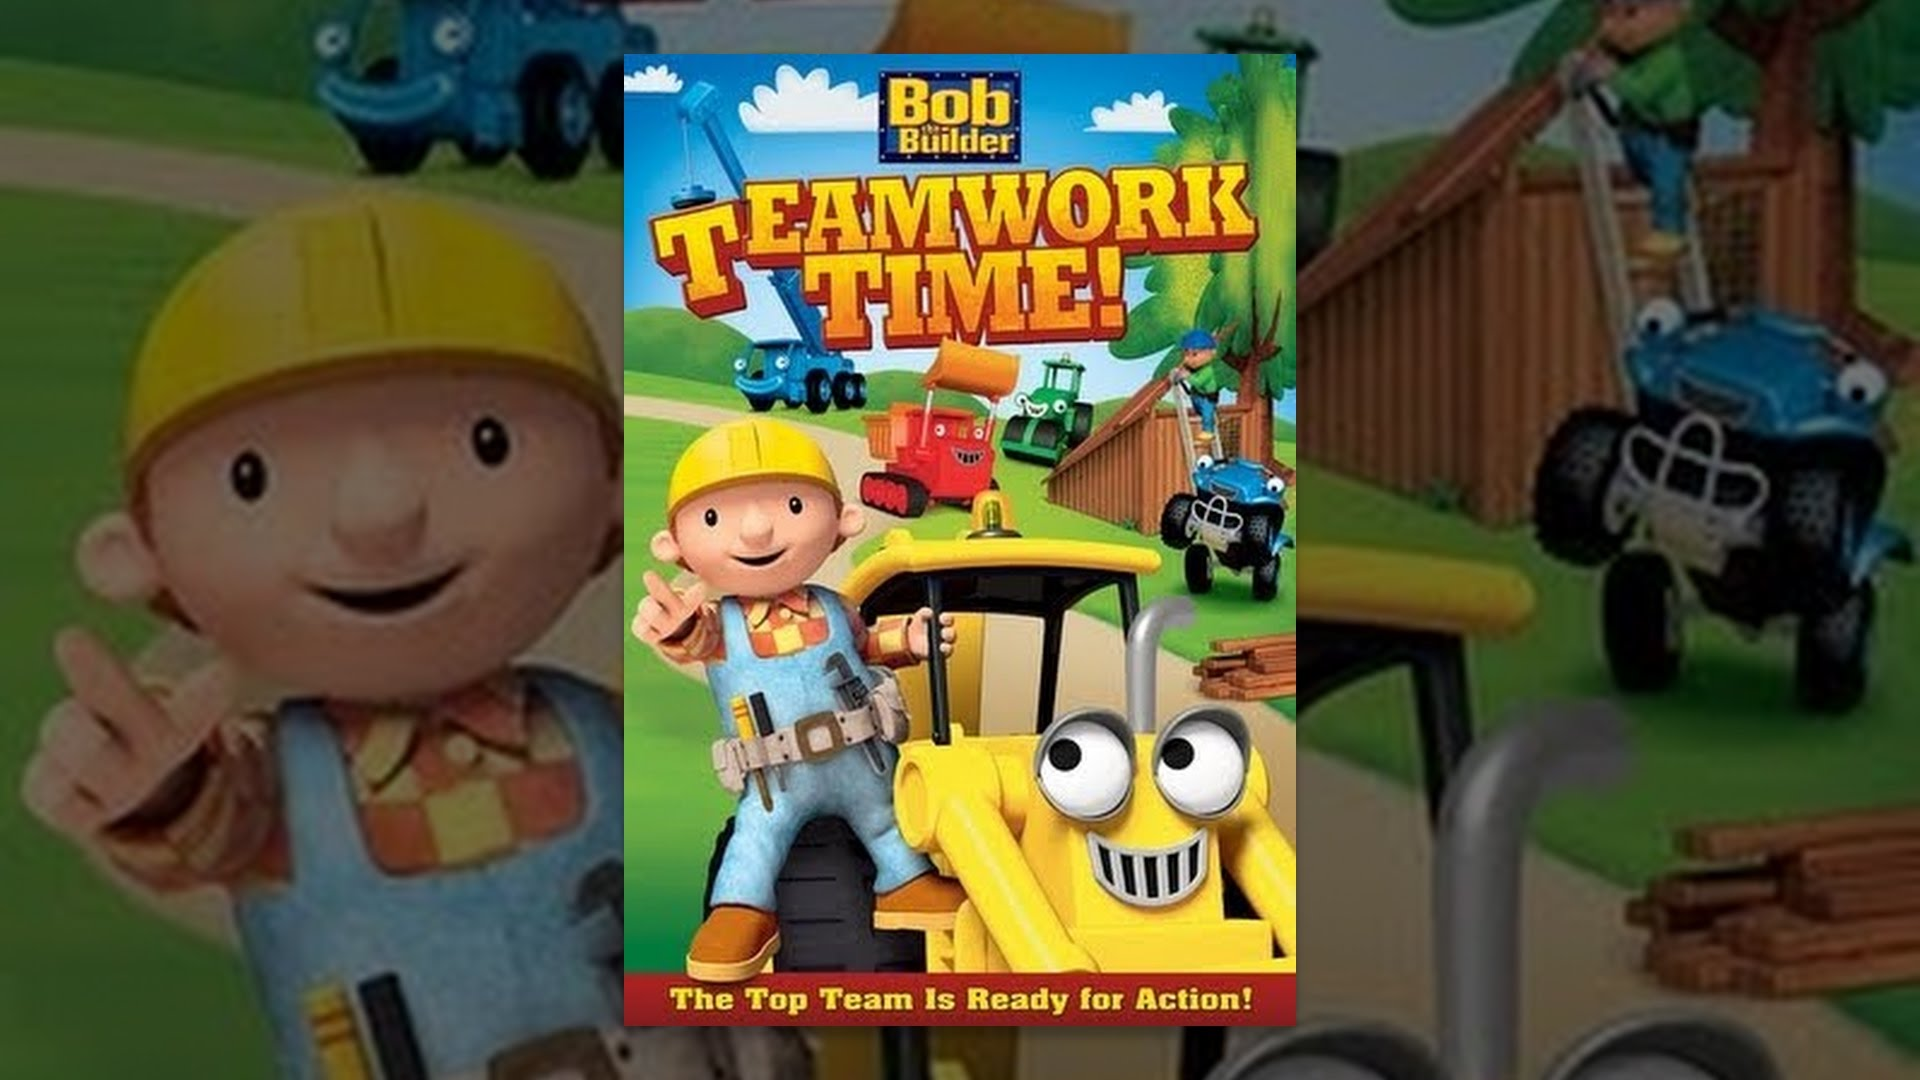 Bob the builder live online dvd rental - Bob The Builder Teamwork Time